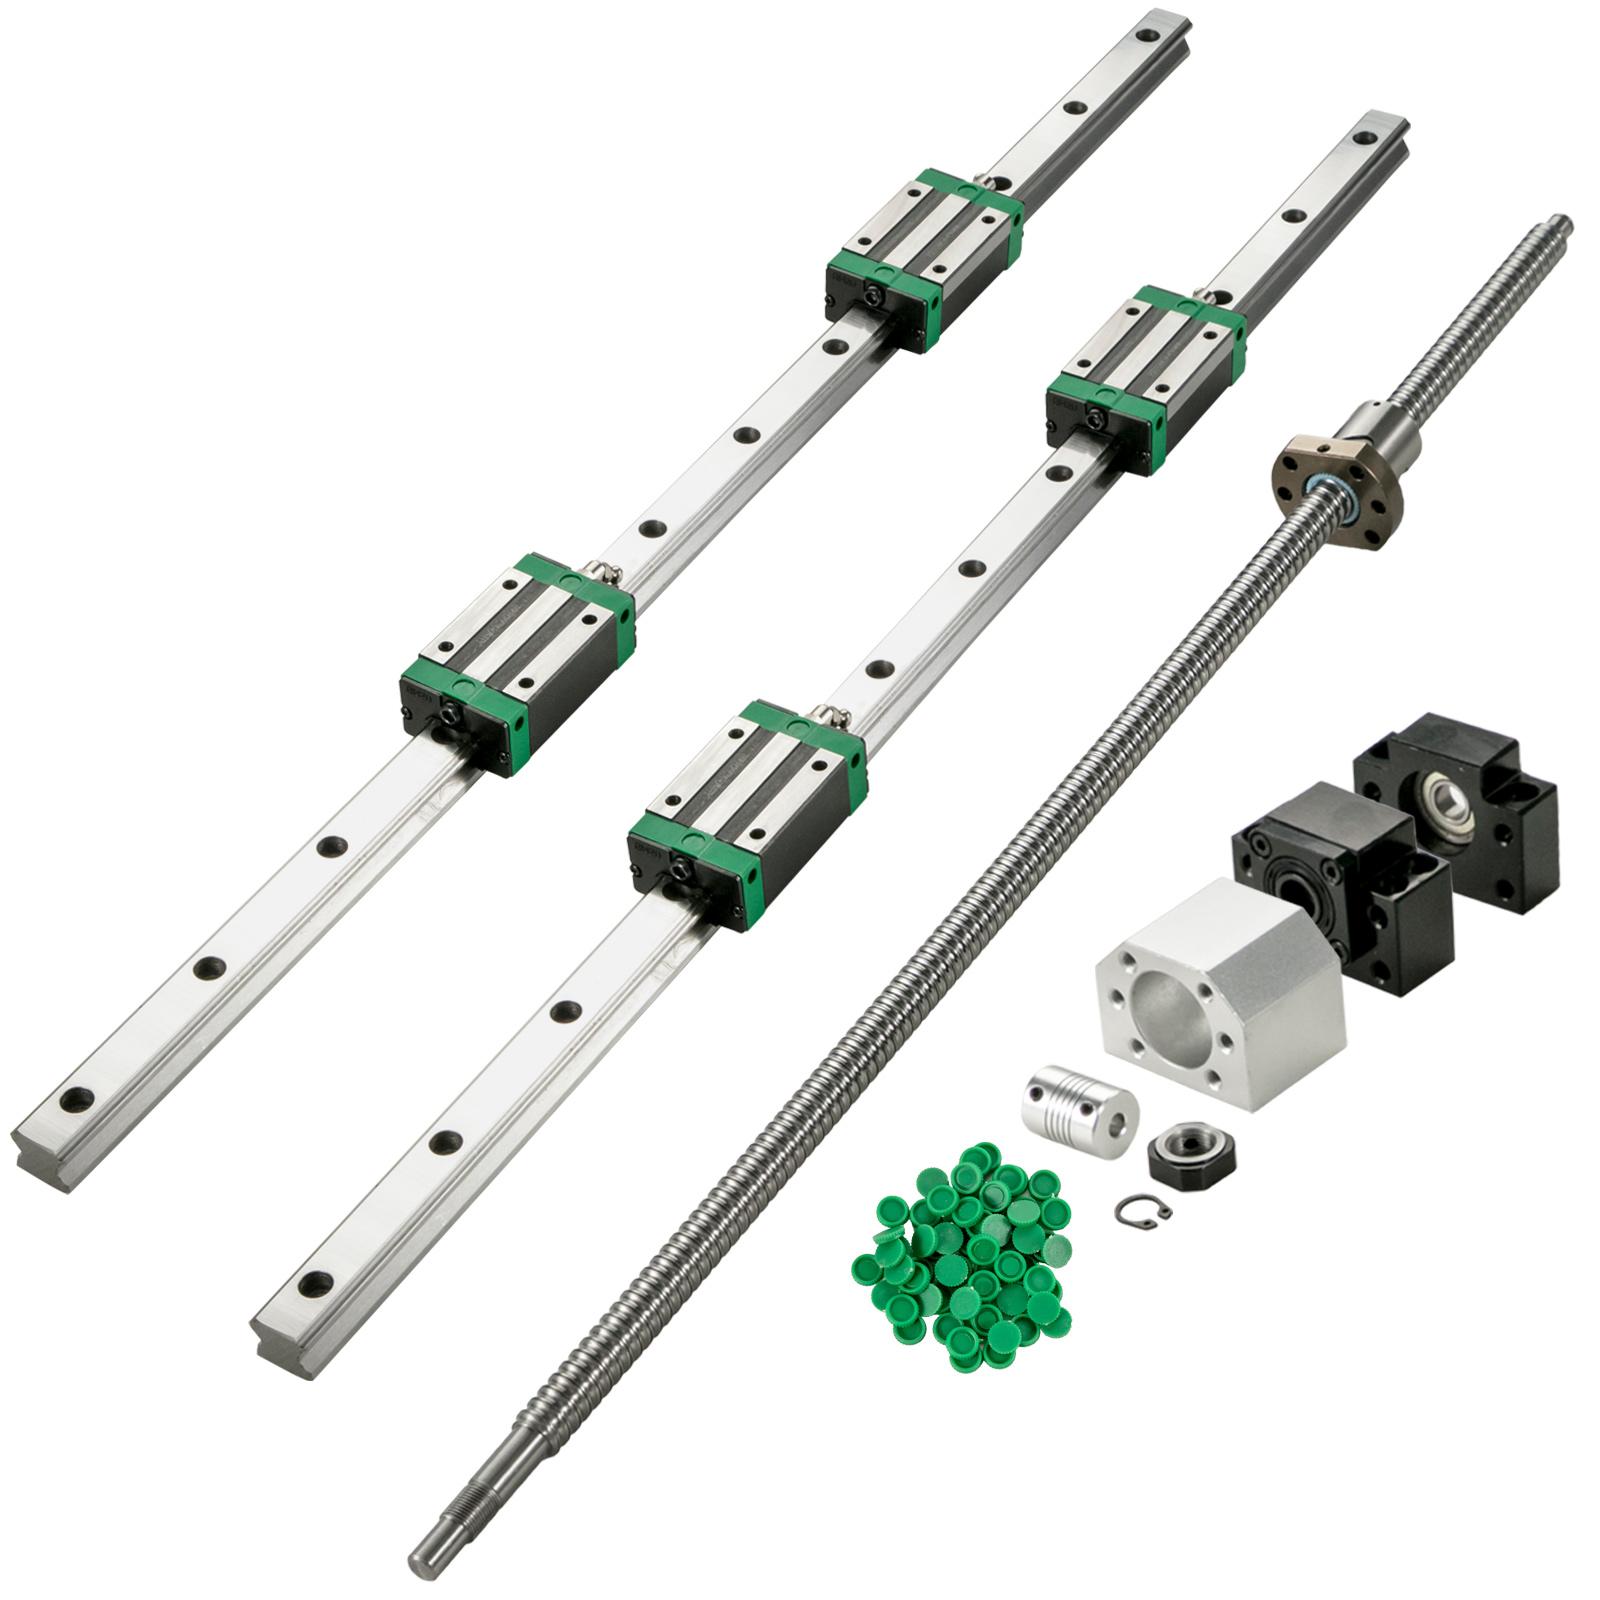 Guida-Lineare-CNC-HGR20-200mm-2-Pezzi-Blocco-di-Cuscinetti-4-Pezzi miniatura 12